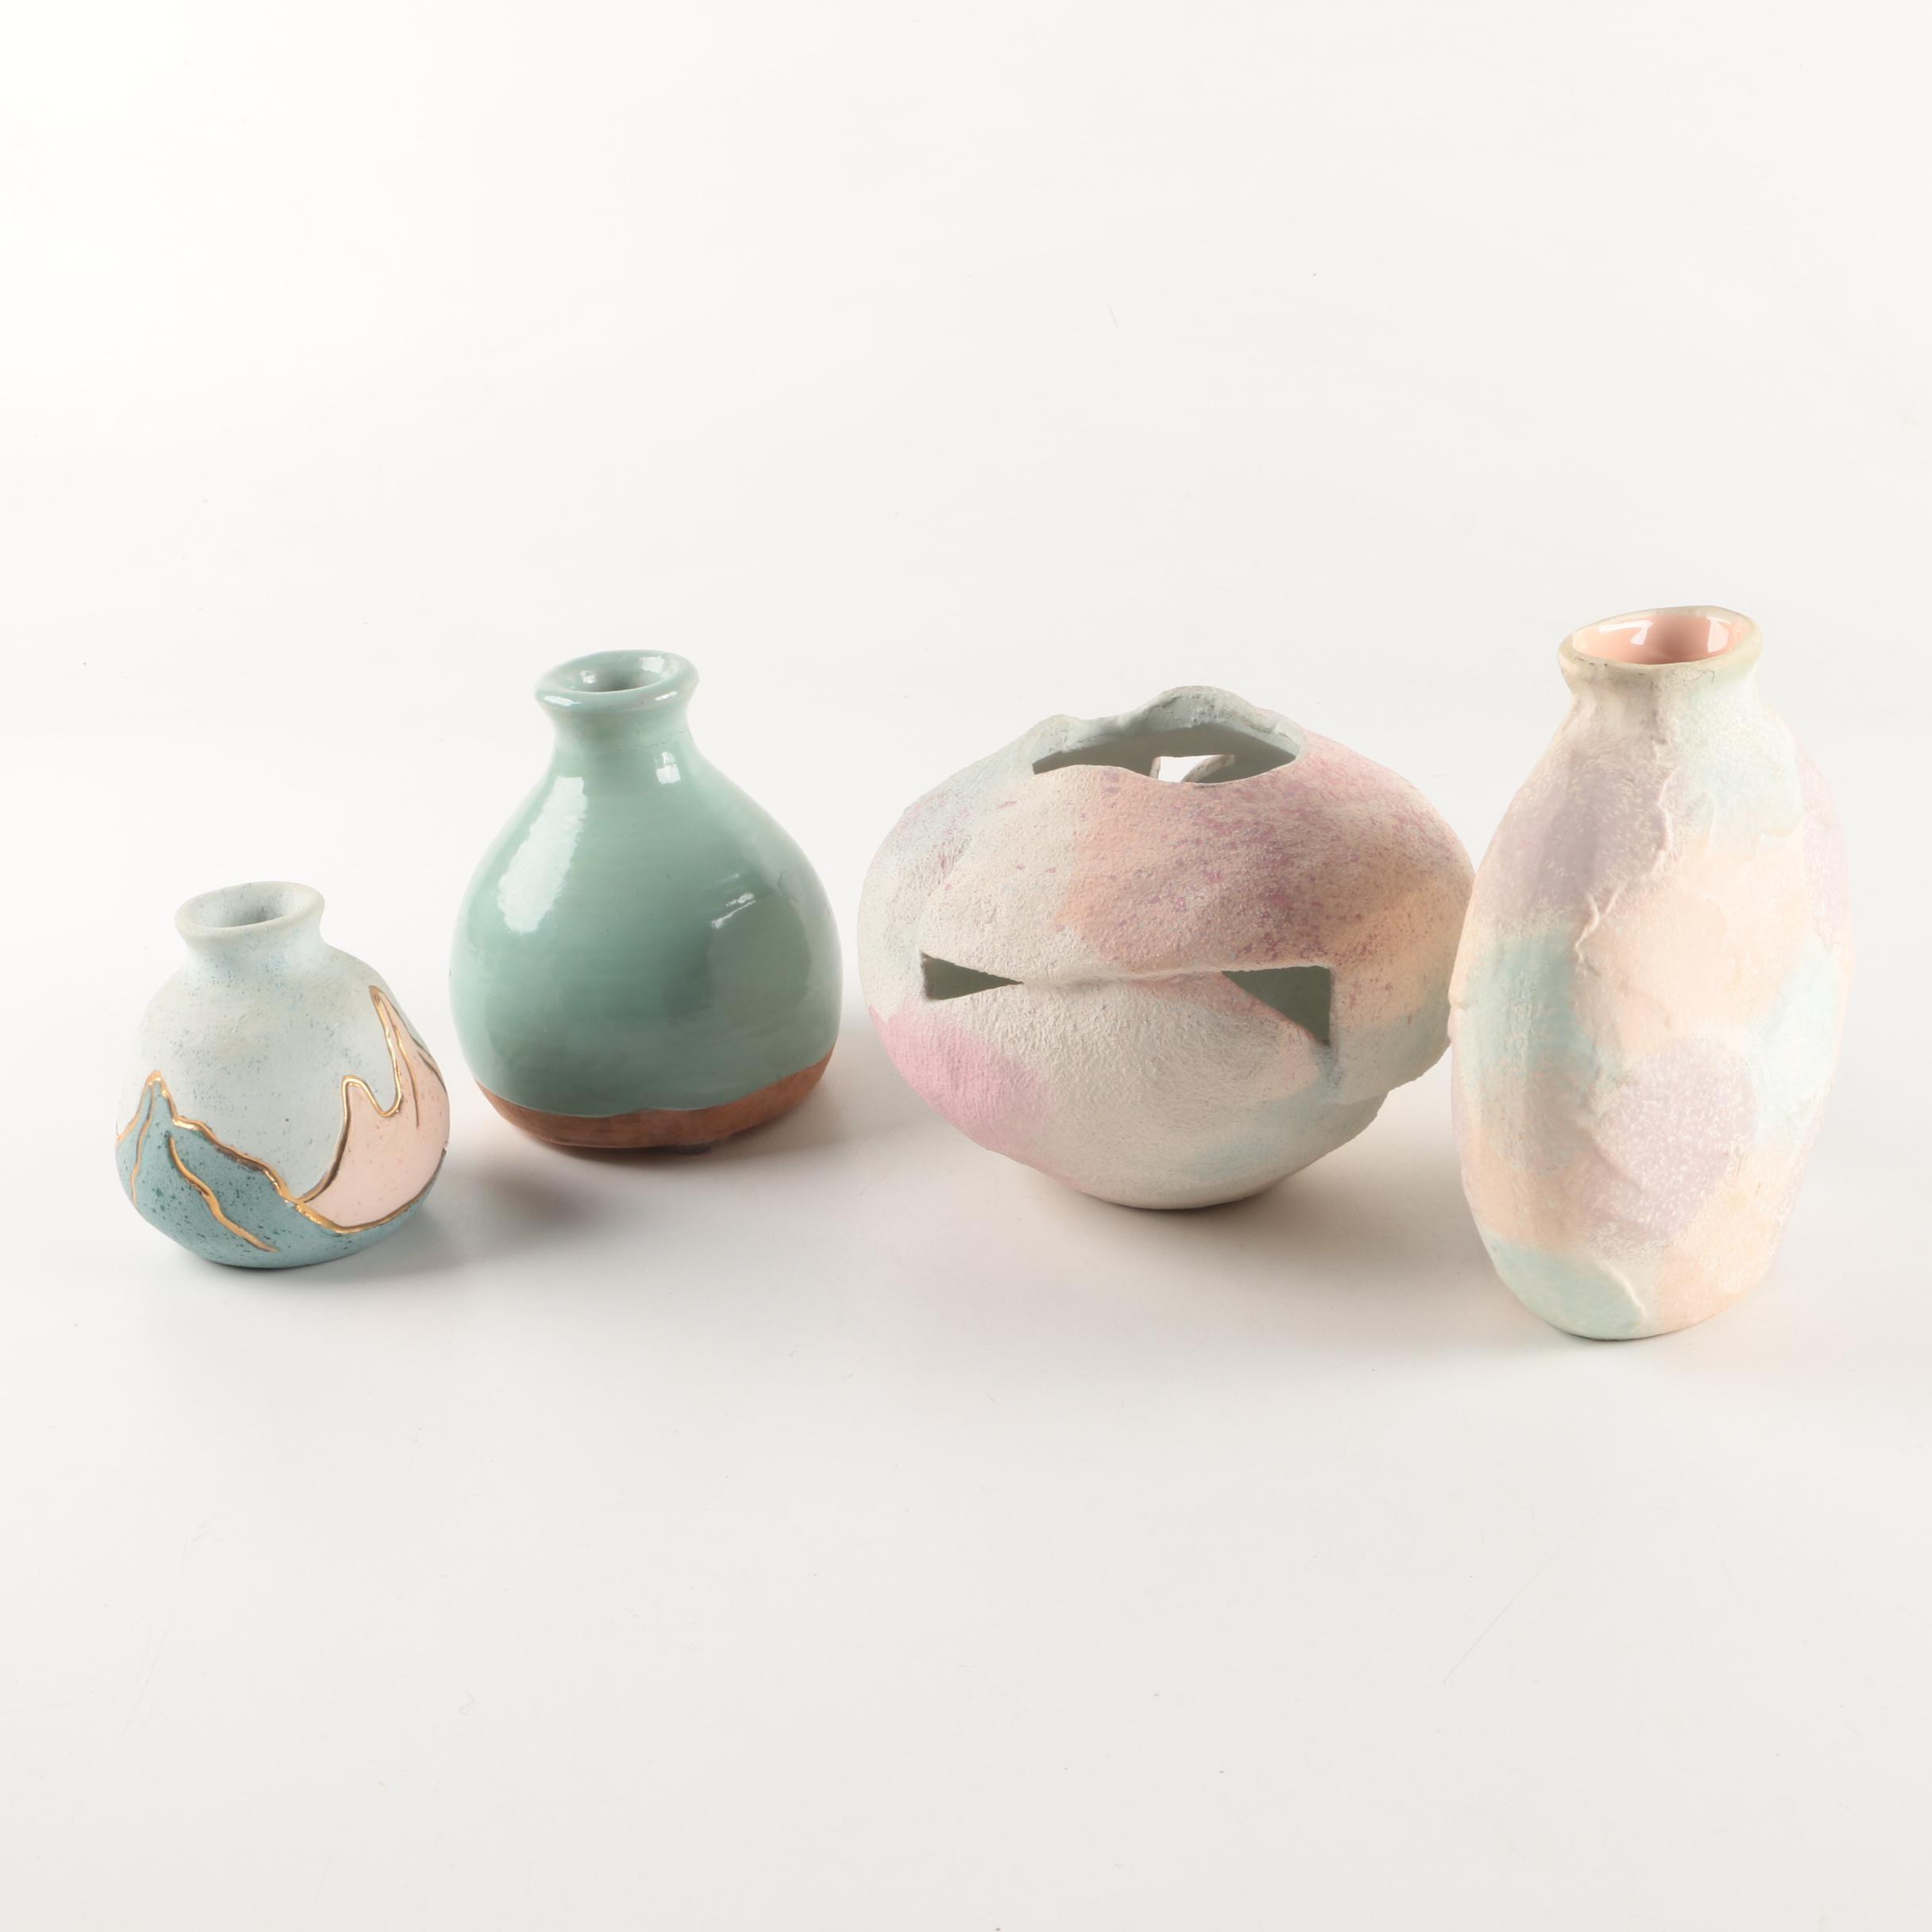 Signed Art Pottery Vases